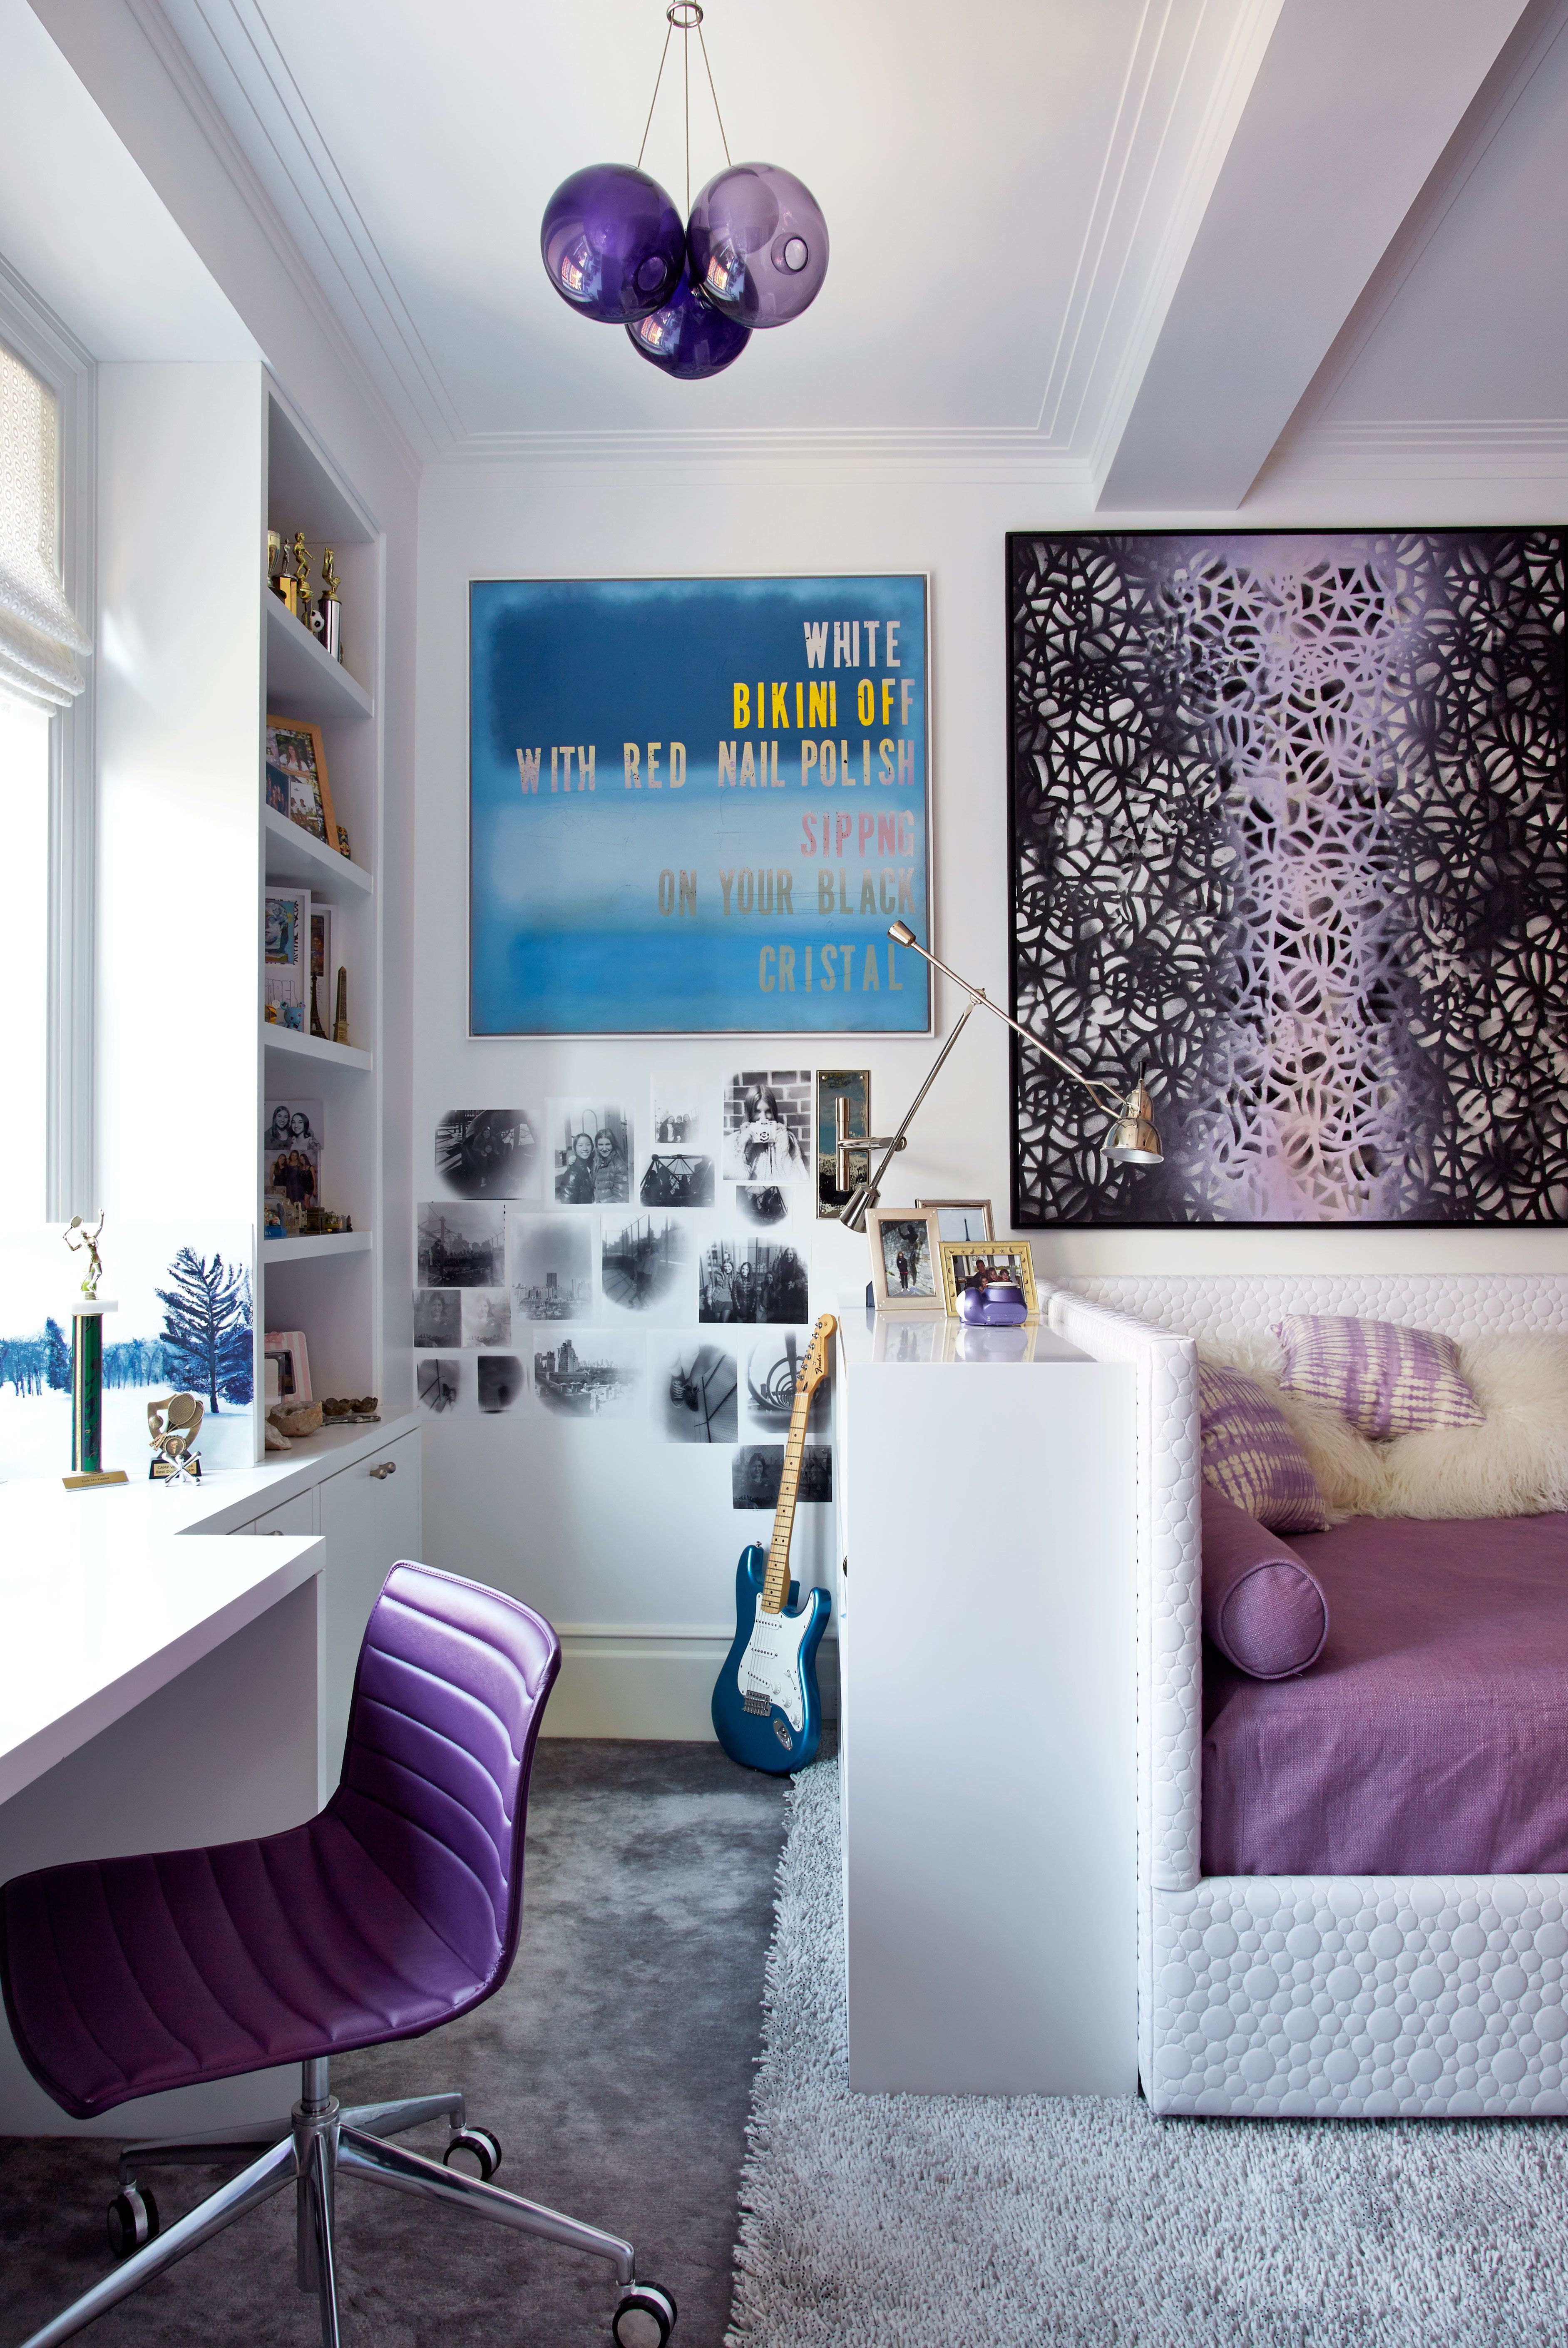 Luxury Showcase For Living Room Royal Art Deco: David Mann Designs A New York City Apartment